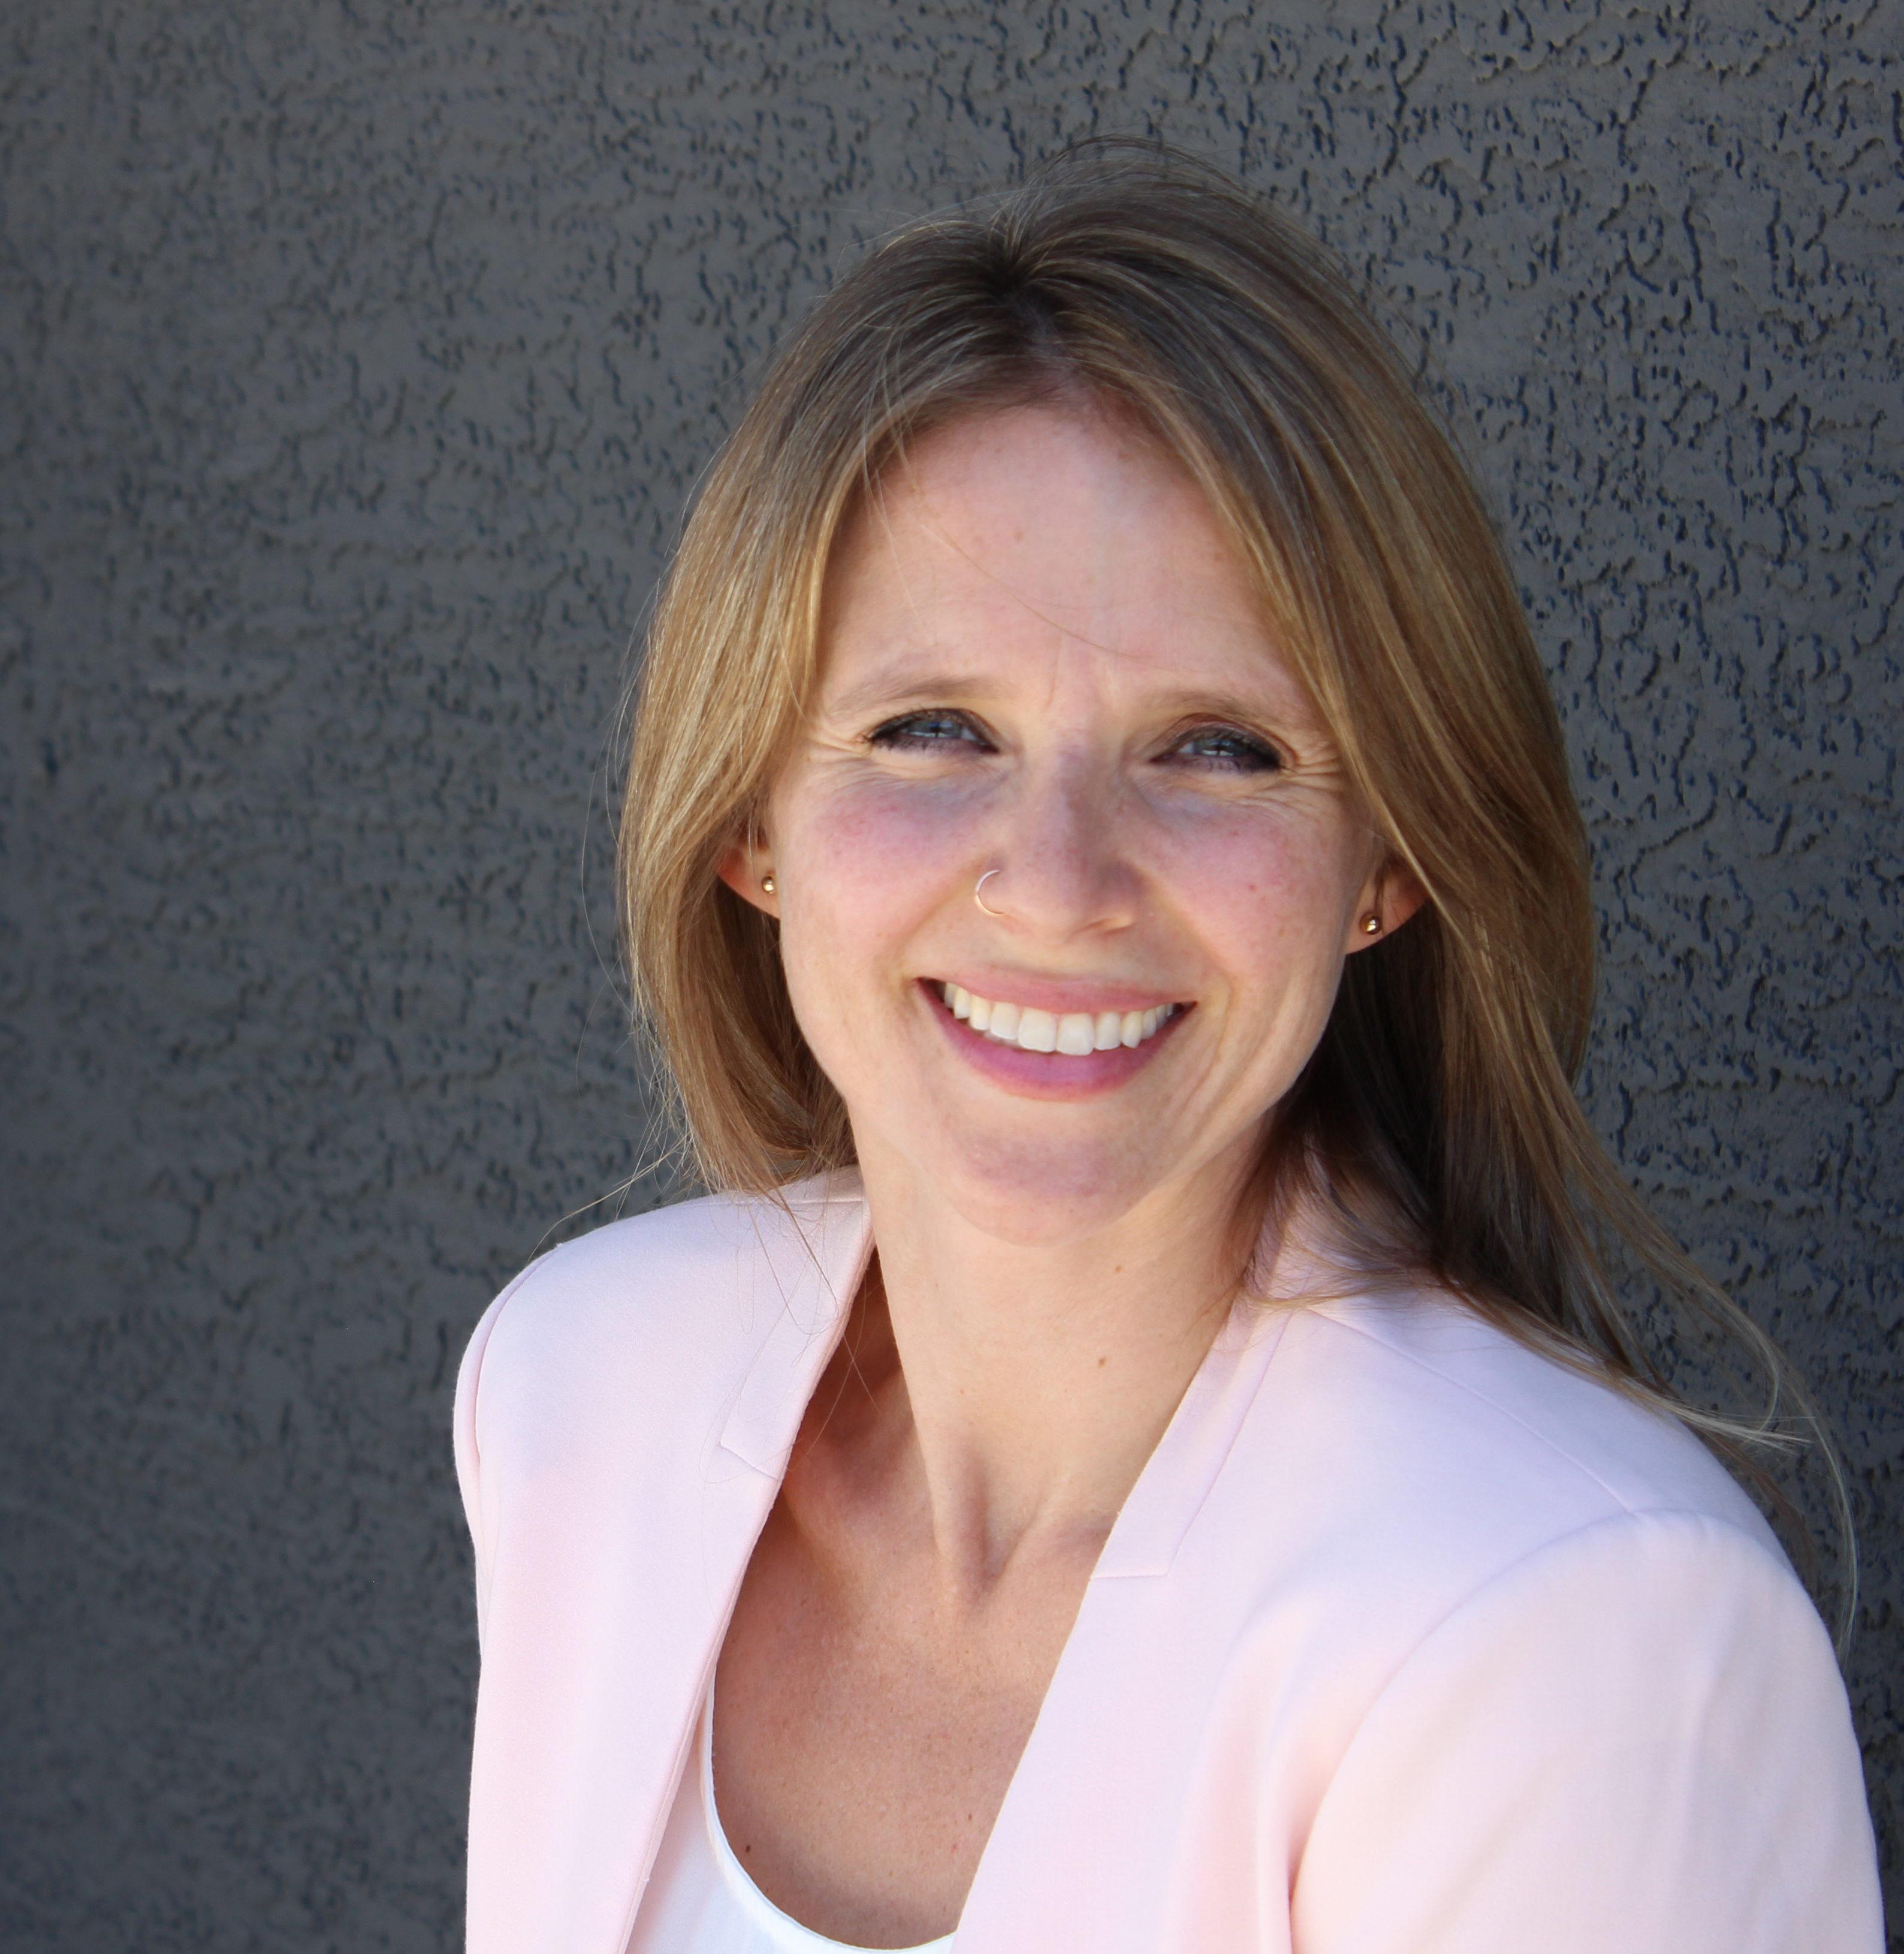 Sarah Merkle